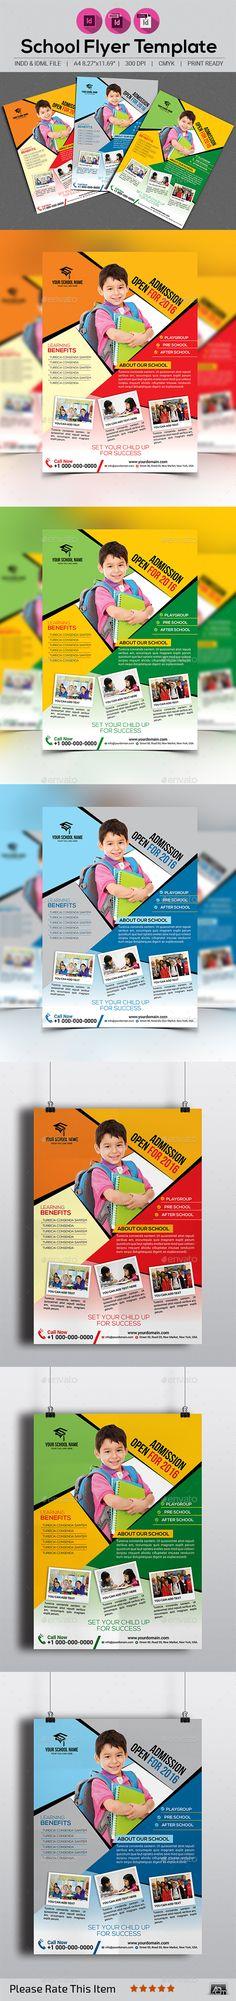 school flyer design template flyers design print template vector